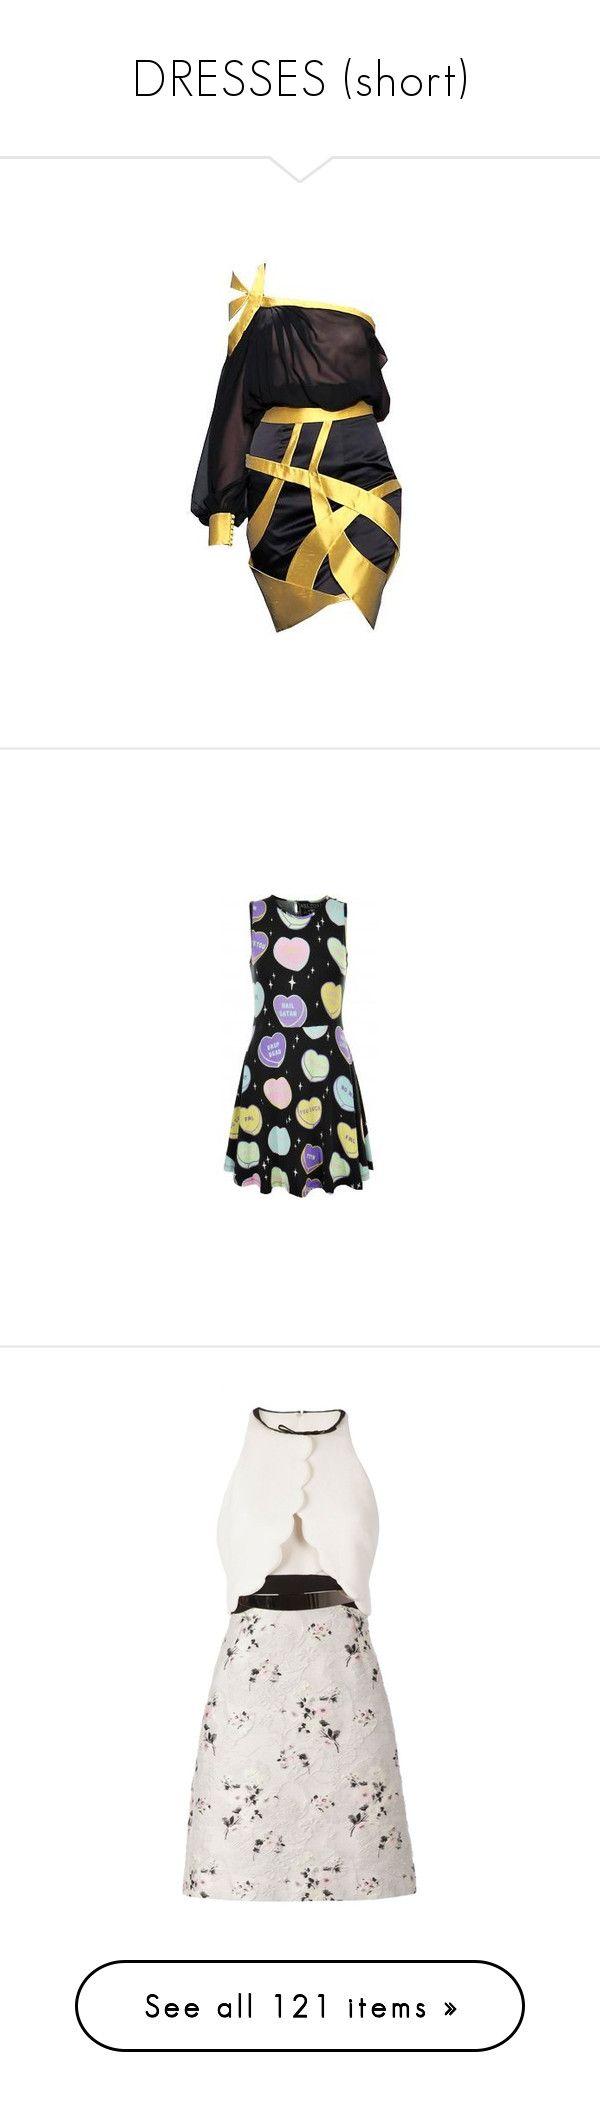 """DRESSES (short)"" by beedalee ❤ liked on Polyvore featuring dresses, gowns, short dresses, vestidos, mini dress, scoop neck dress, killstar dress, multi color mini dress, multi colored dress and killstar"